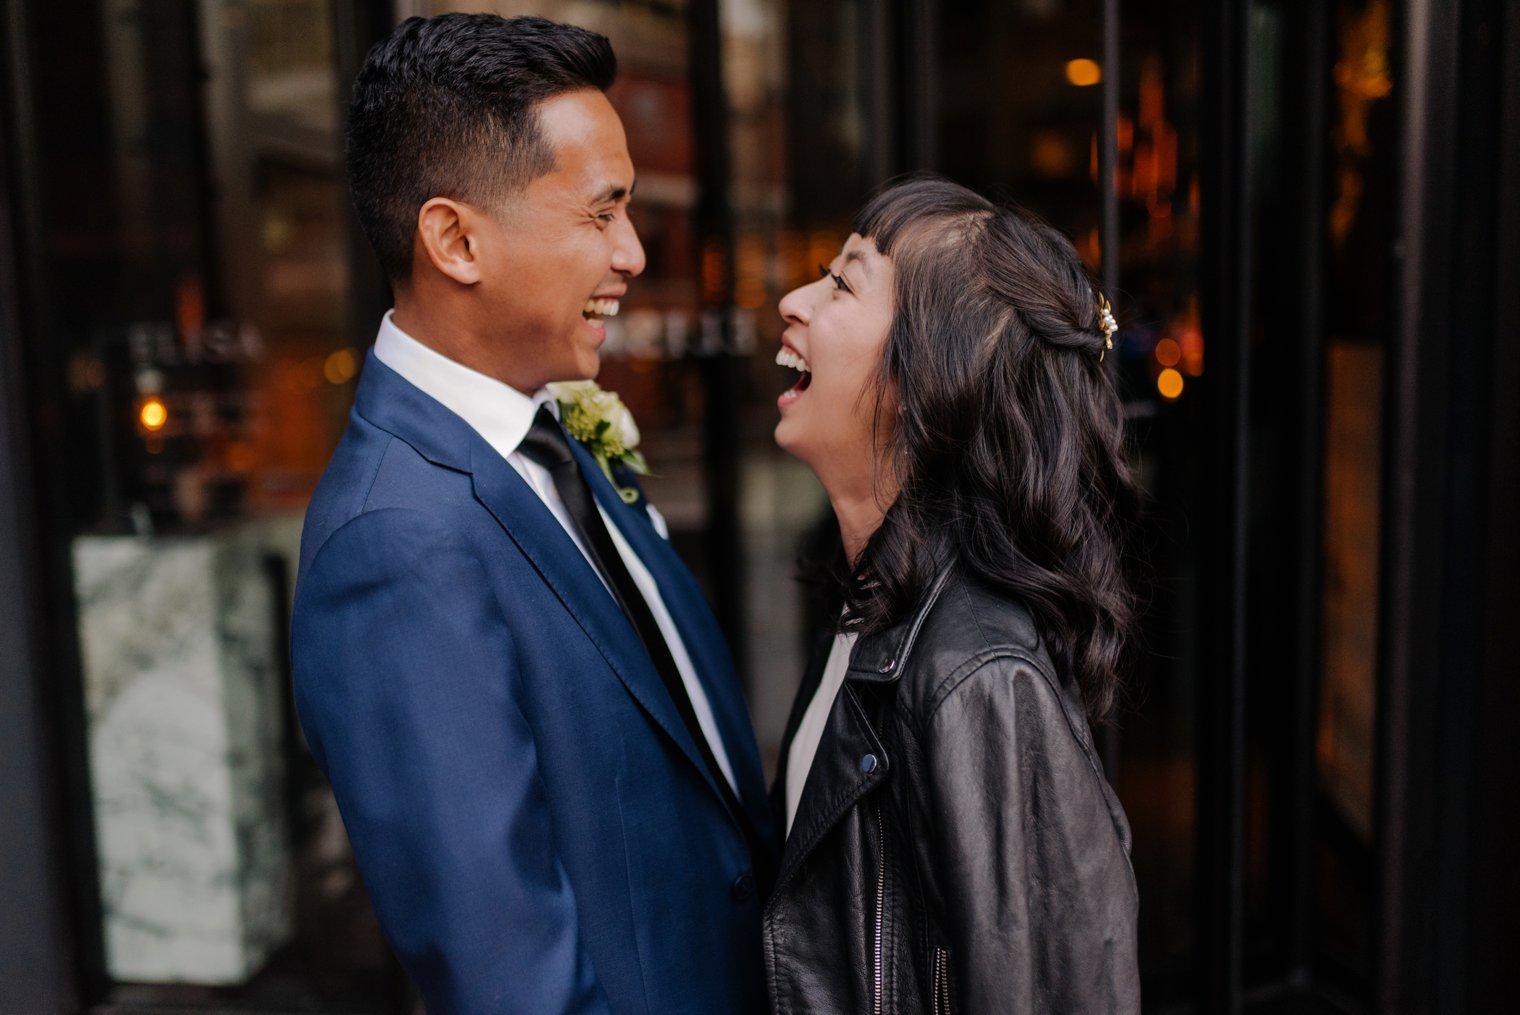 vancouver yaletown wedding portrait